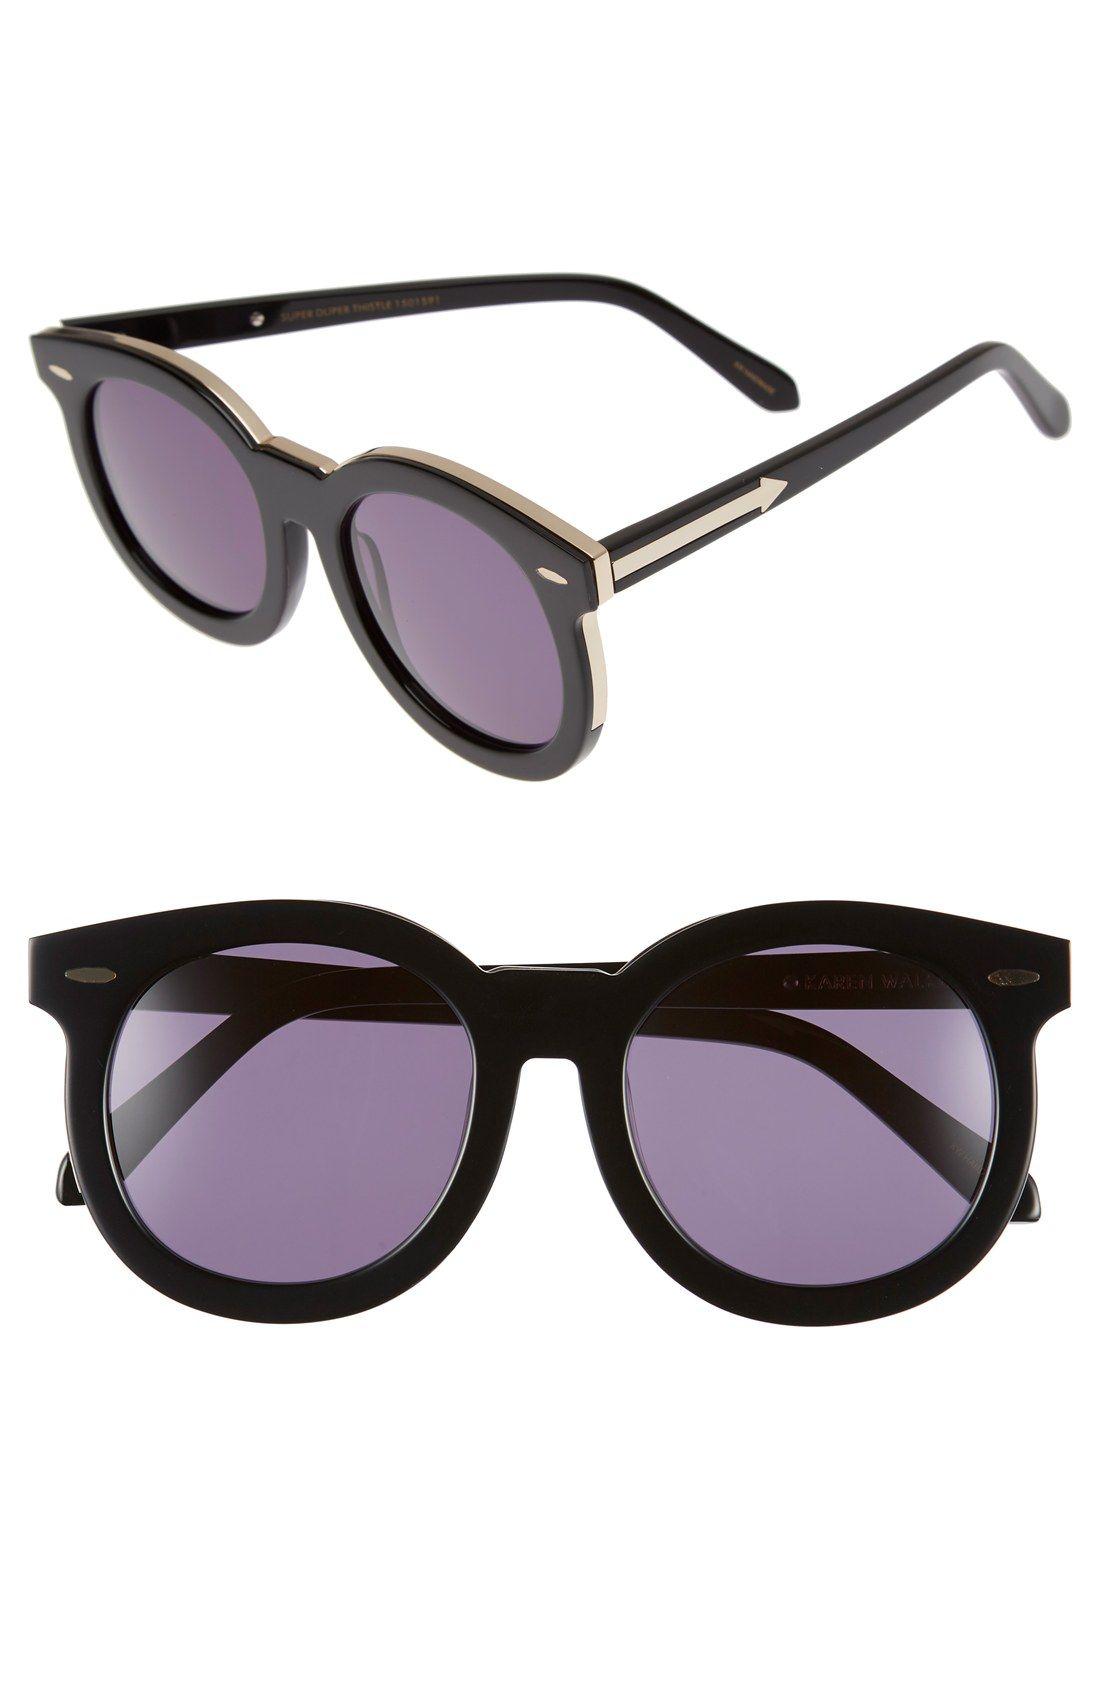 'Super Duper Thistle' 52mm Retro Sunglasses